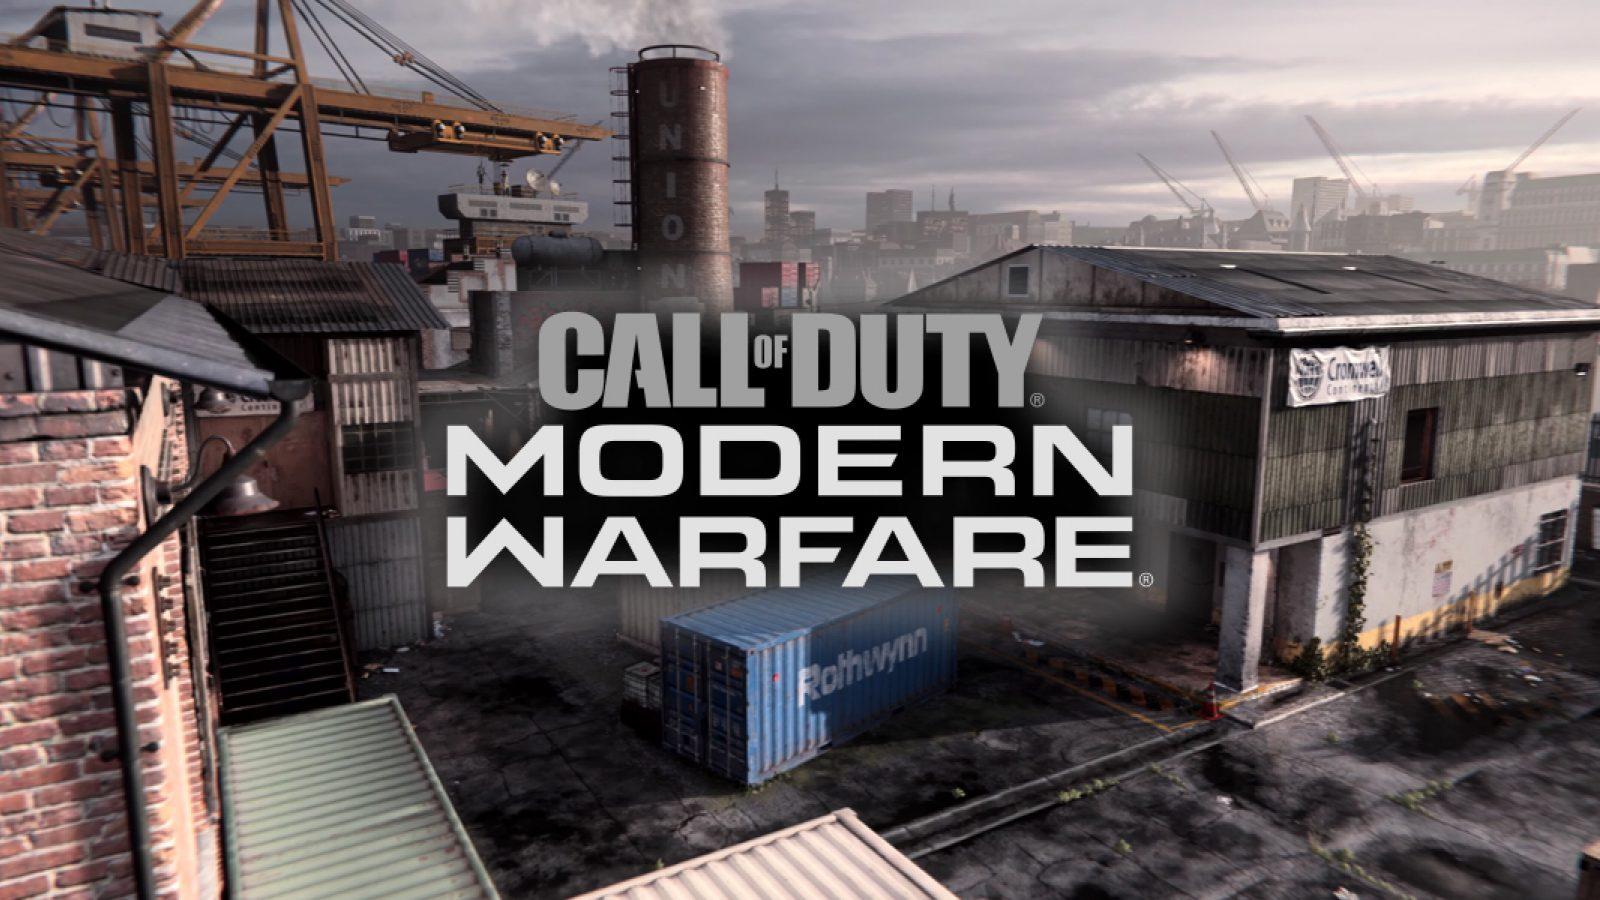 call-duty-modern-warfare-multiplayer-maps